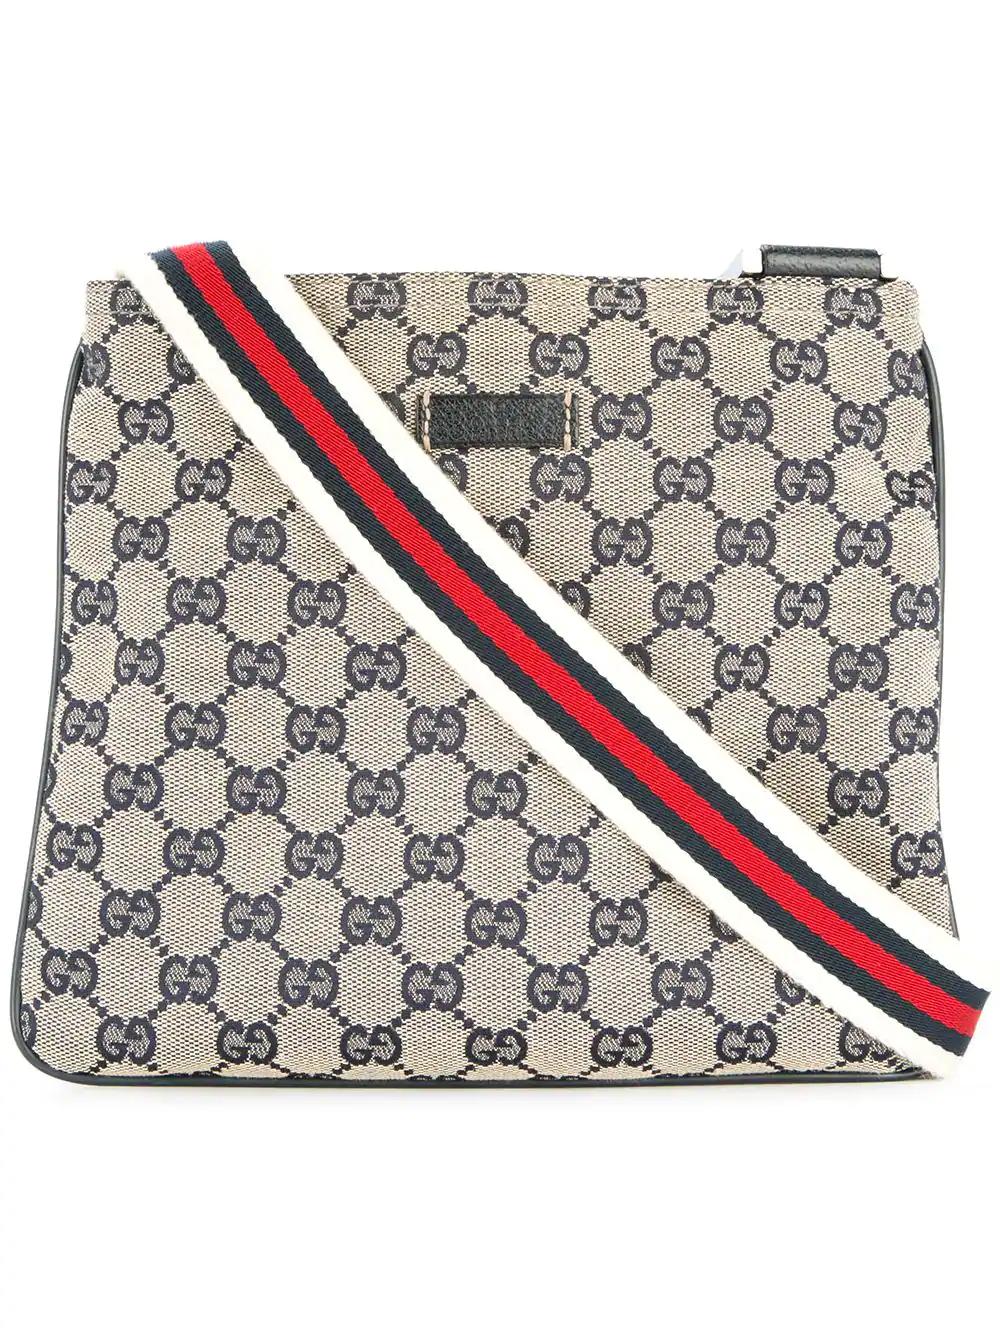 d18d0321e41 Gucci Vintage Gg Shelly Line Cross Body Shoulder Bag - Brown